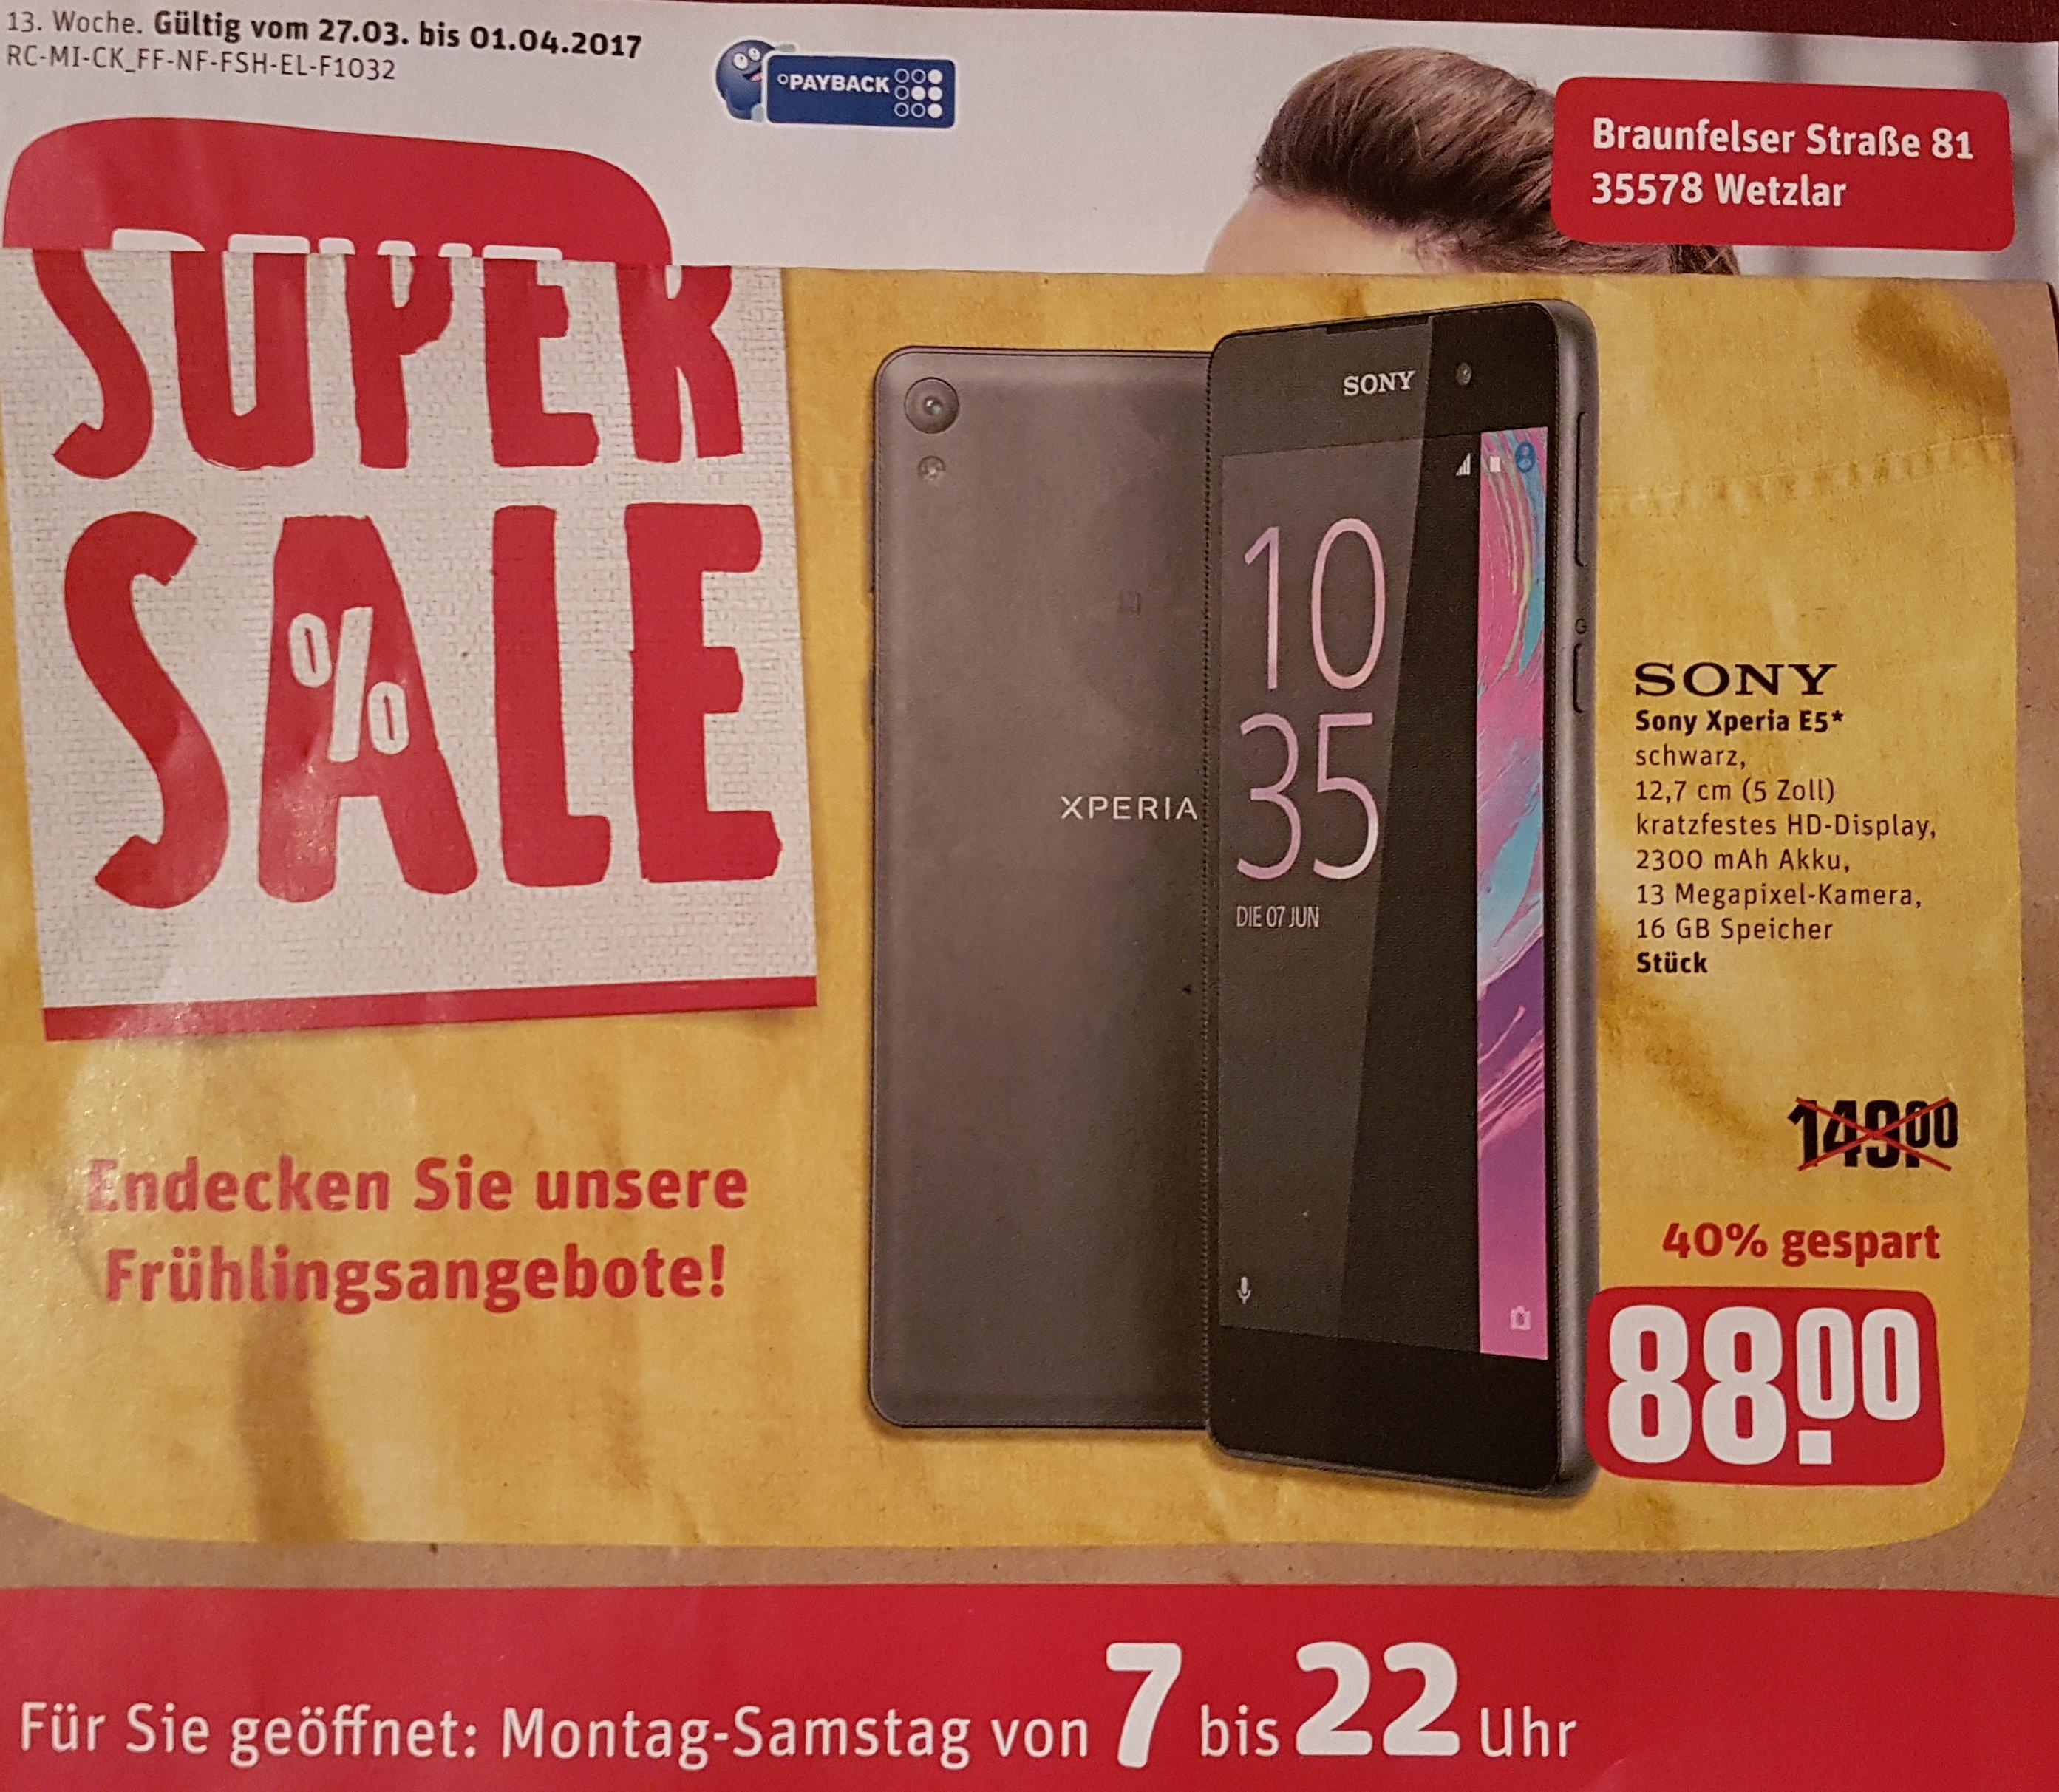 [Lokal Wetzlar] Sony Xperia E5 Rewe Center PVG: 134,99€